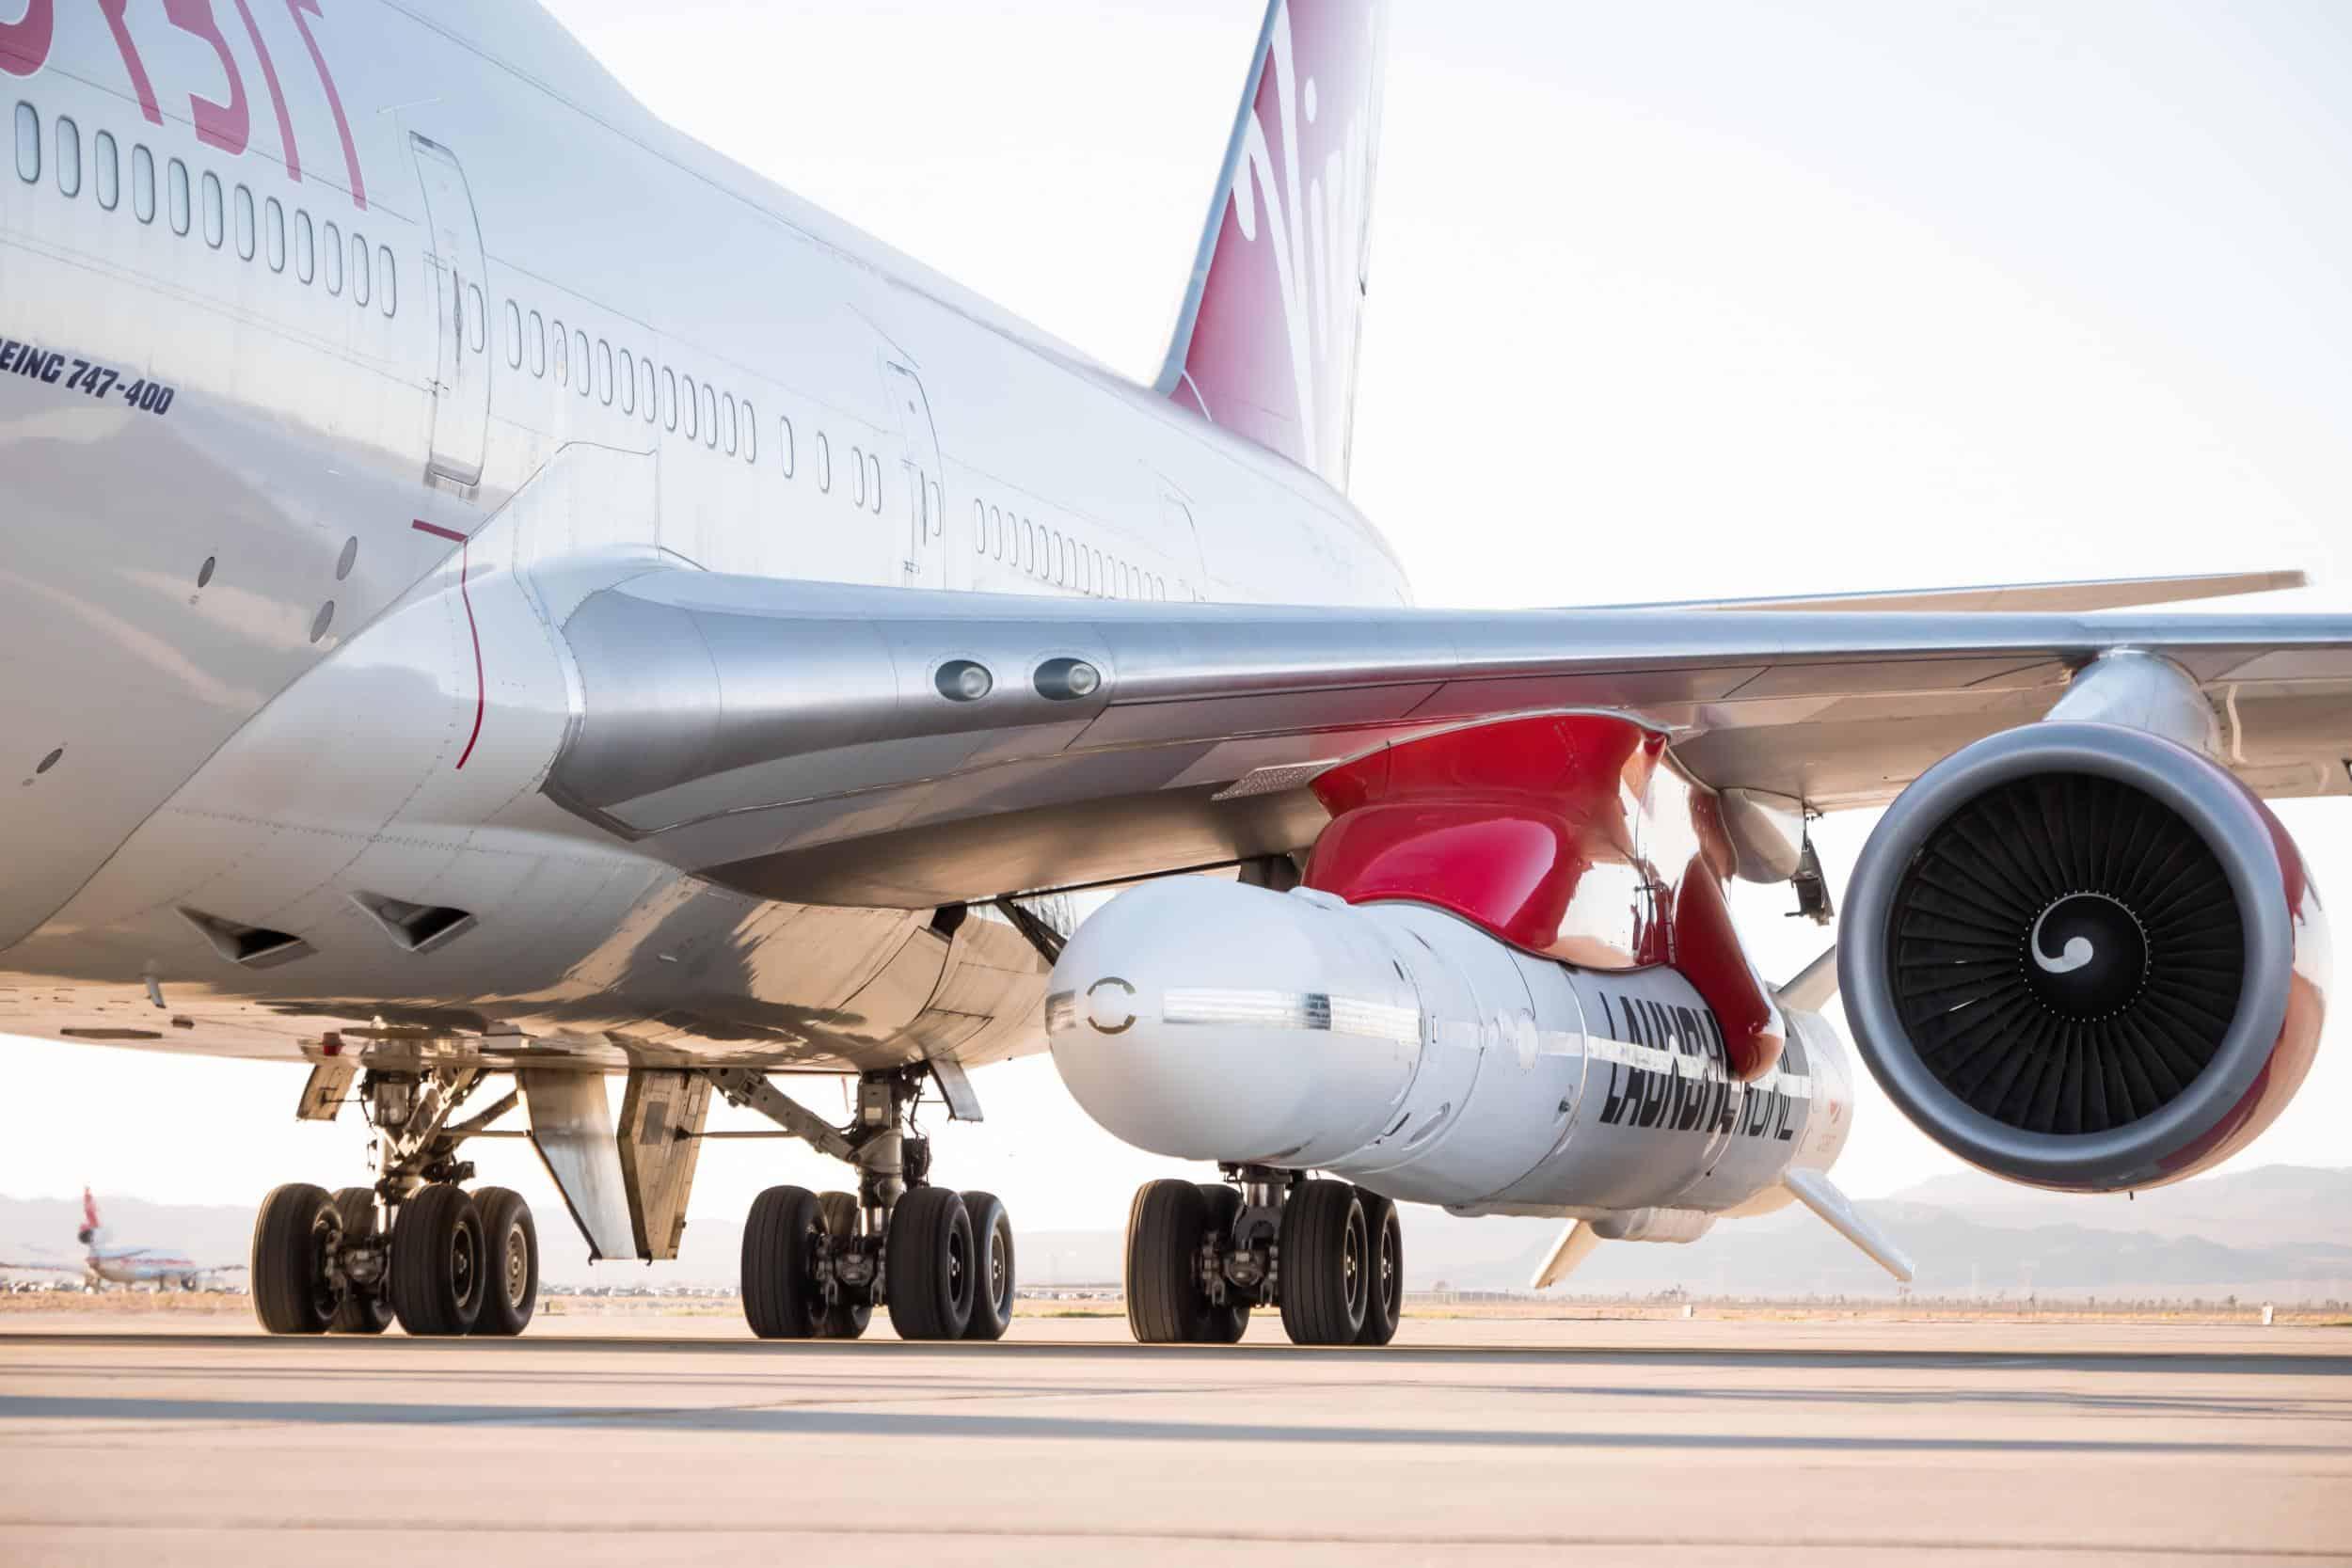 Virgin Orbit set to launch space rocket via Boeing 747 aircraft